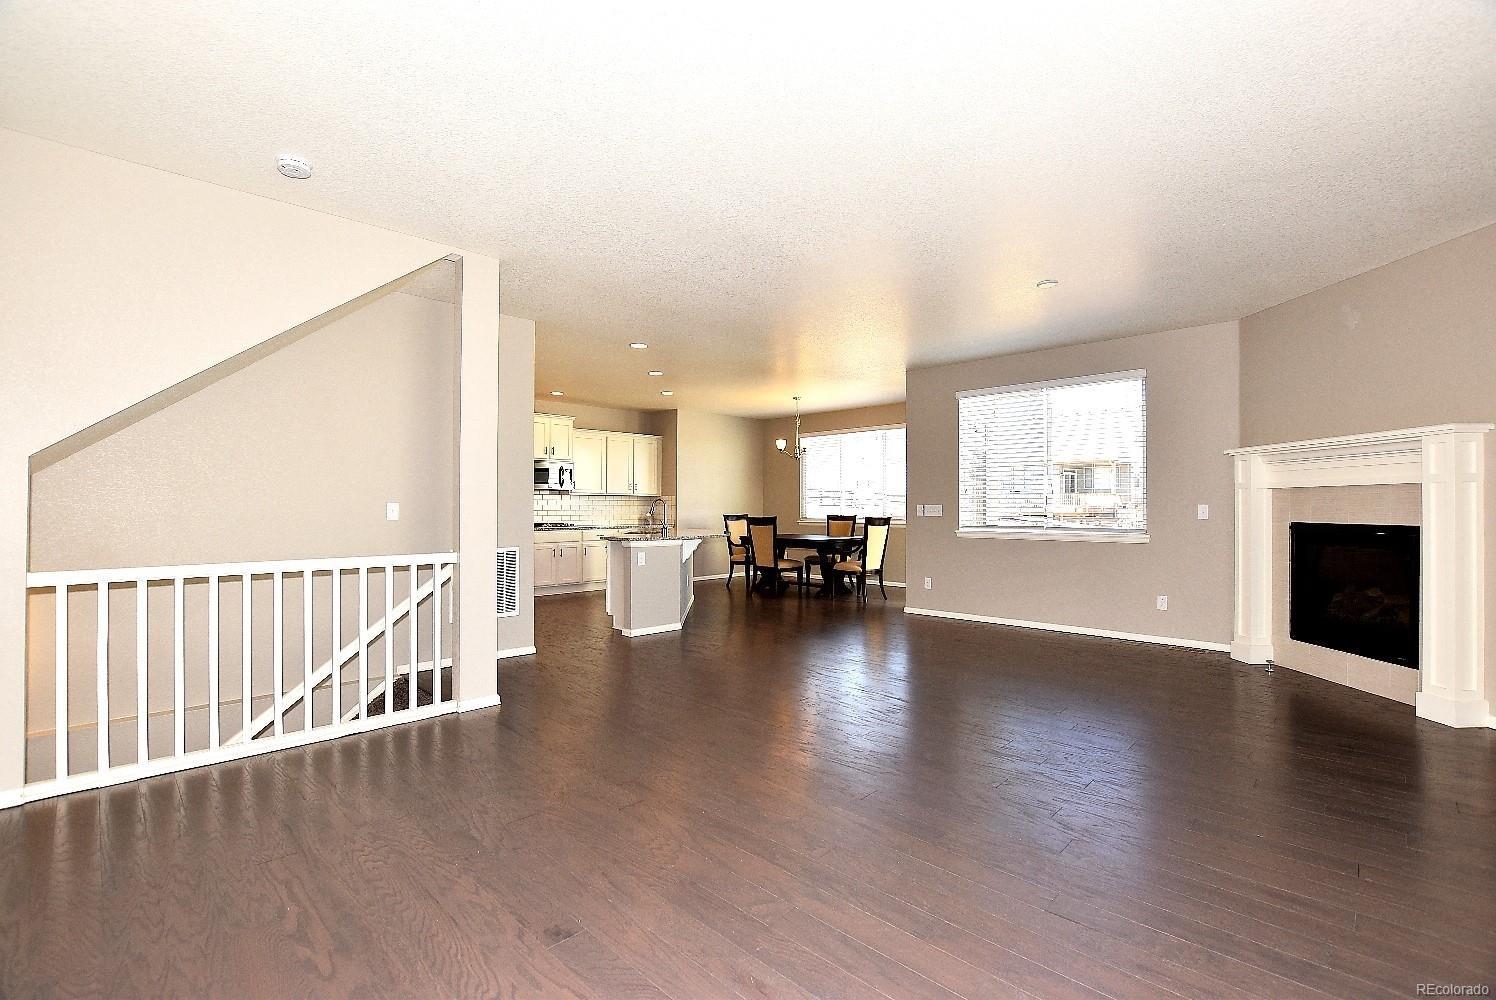 MLS# 7535267 - 1 - 2260  Stonefish Drive, Windsor, CO 80550